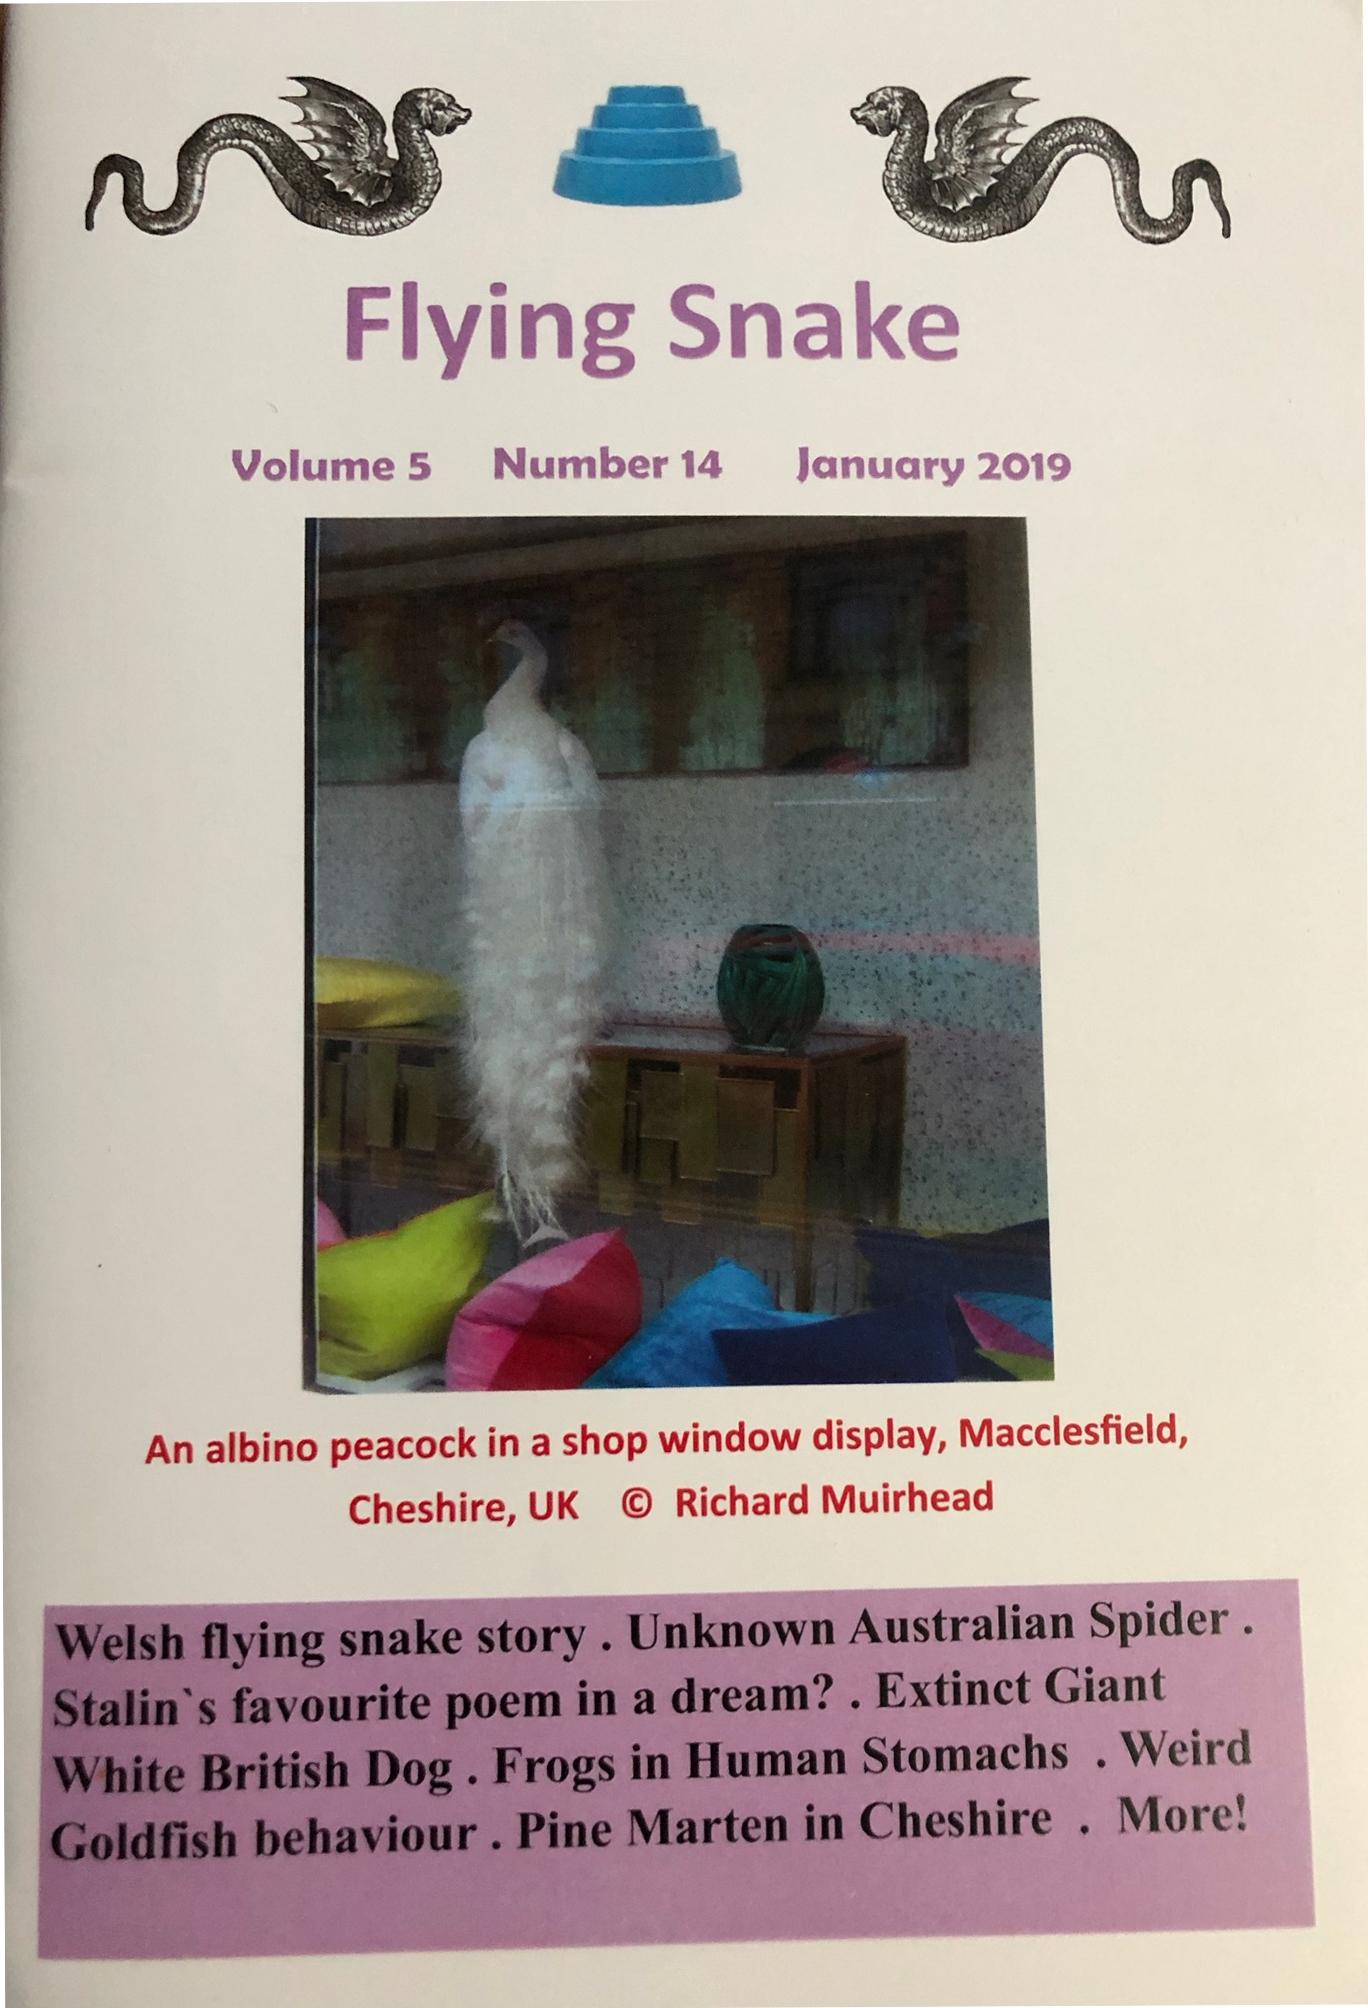 Flying Snake Vol. 5 #14